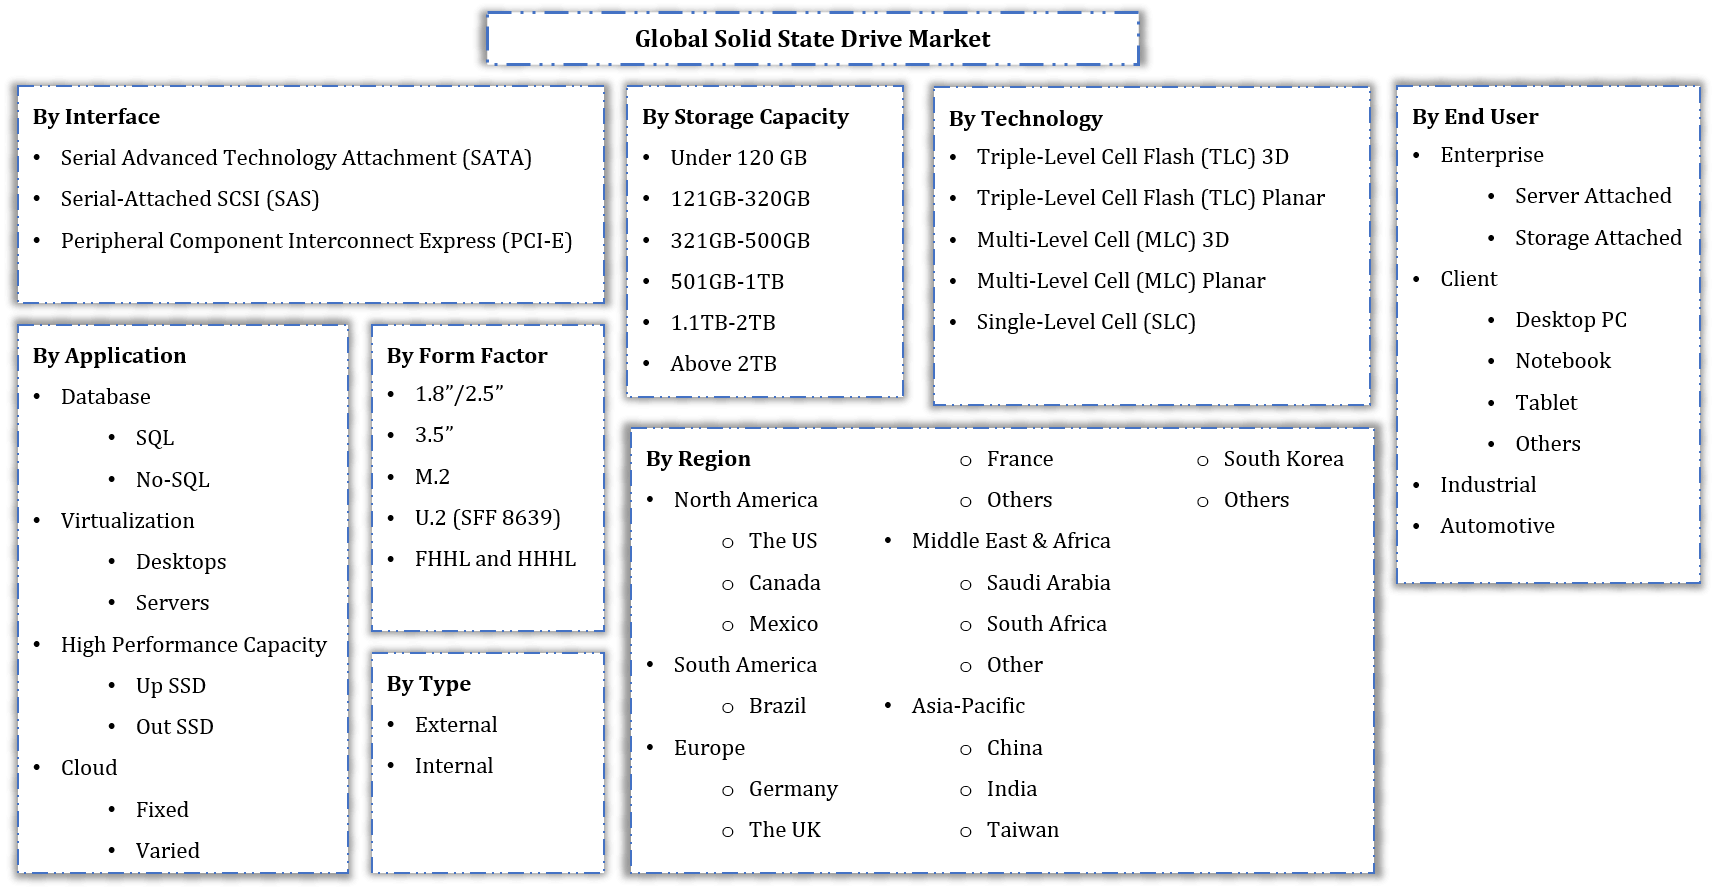 Global Solid State Drive Market Segmentation